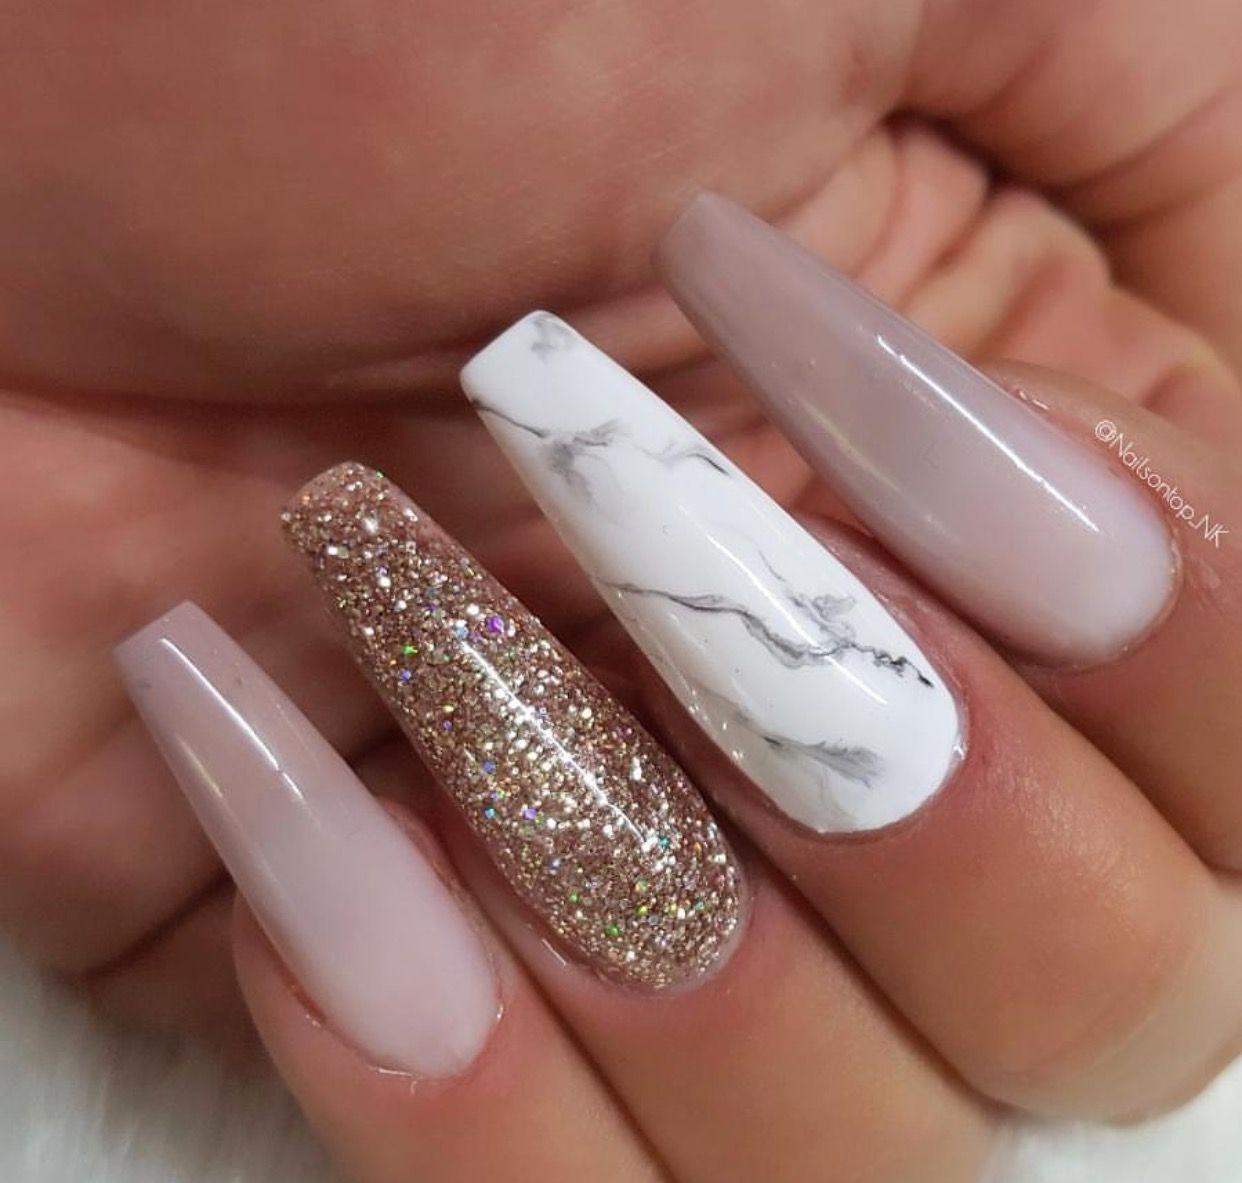 Pin by Kahlisa Malia on Nails | Pinterest | Hazelnut hair, Hard work ...